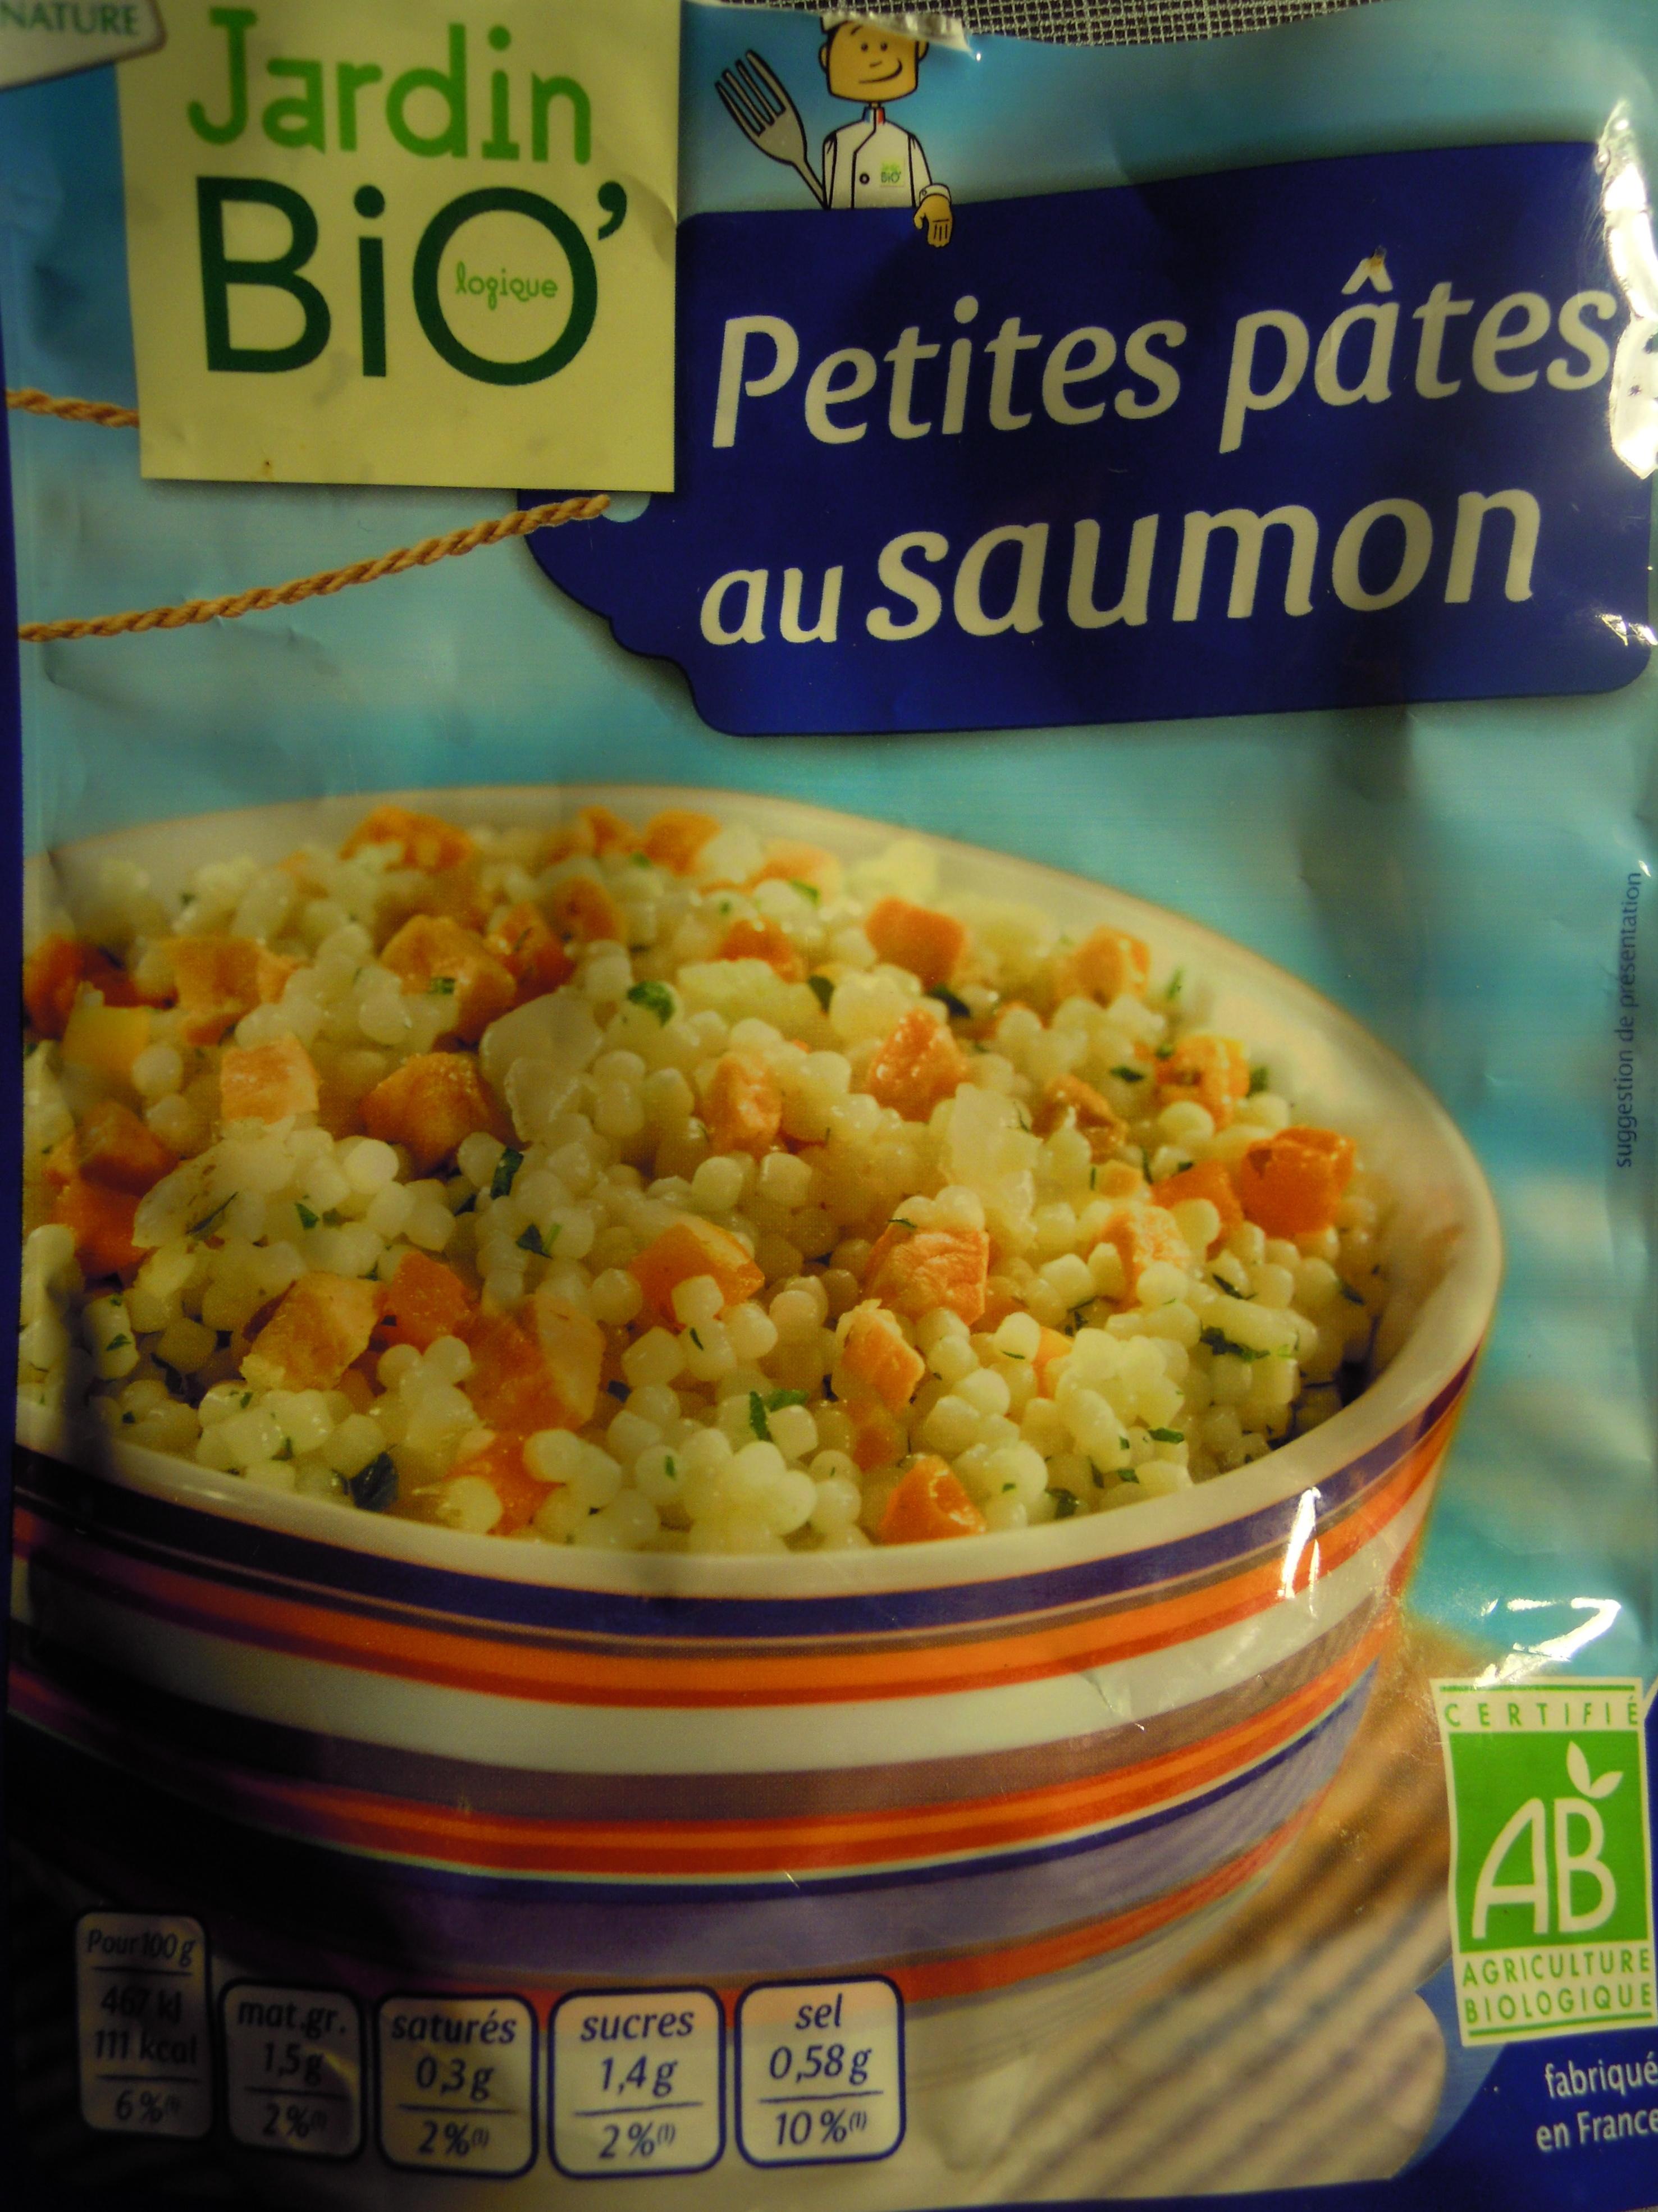 Petites Pâtes au Saumon - Product - fr